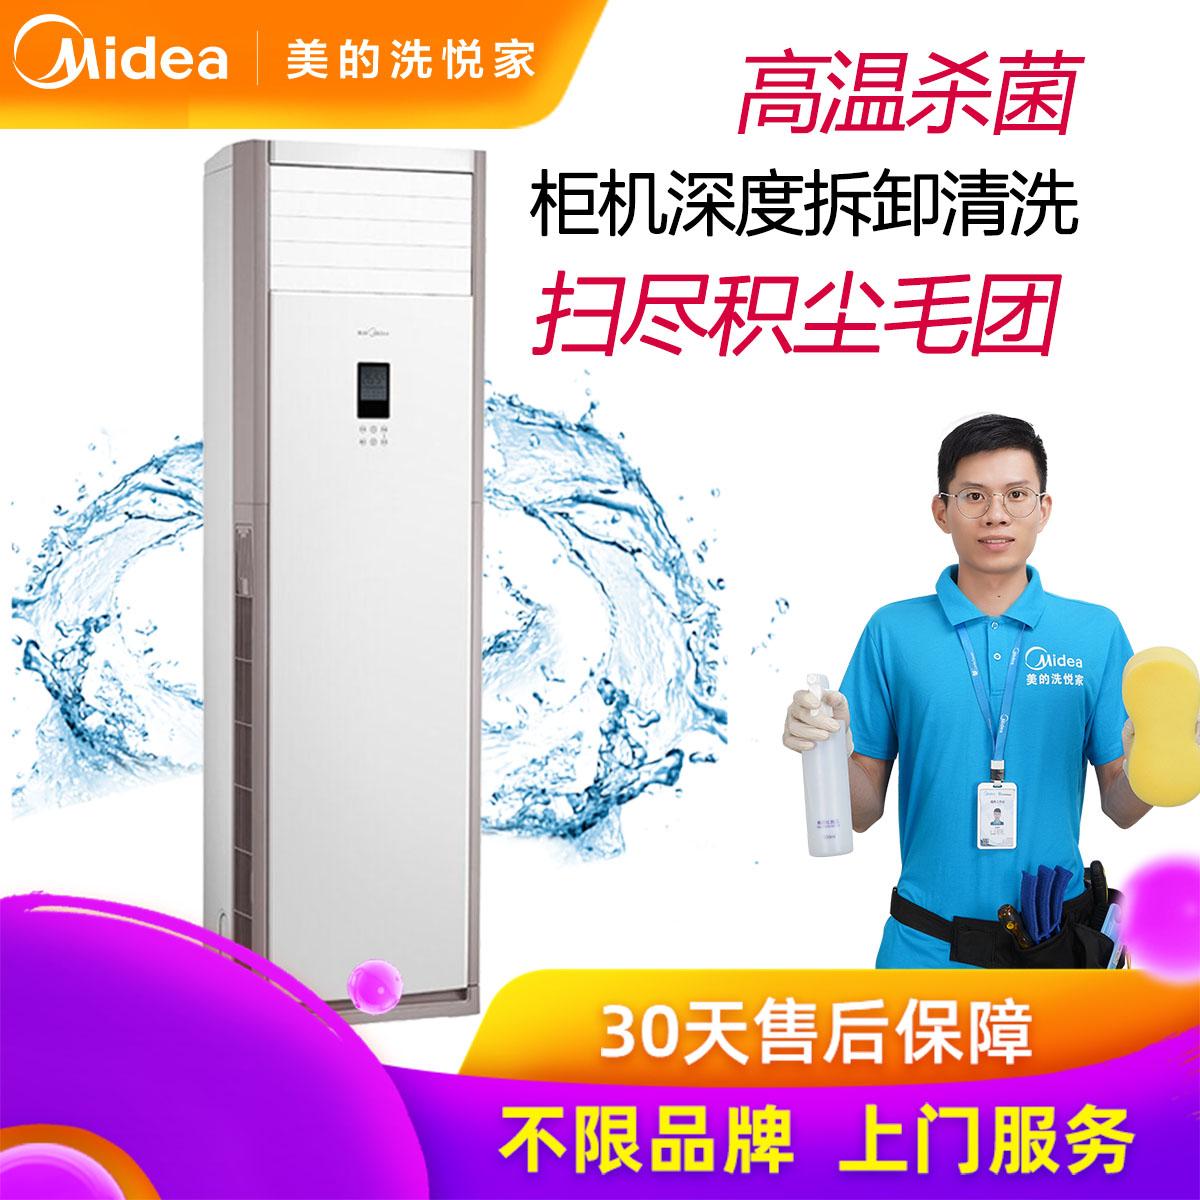 Midea/美的 空调柜机深度清洗上门服务-小区活动清洗服务 说明书.pdf